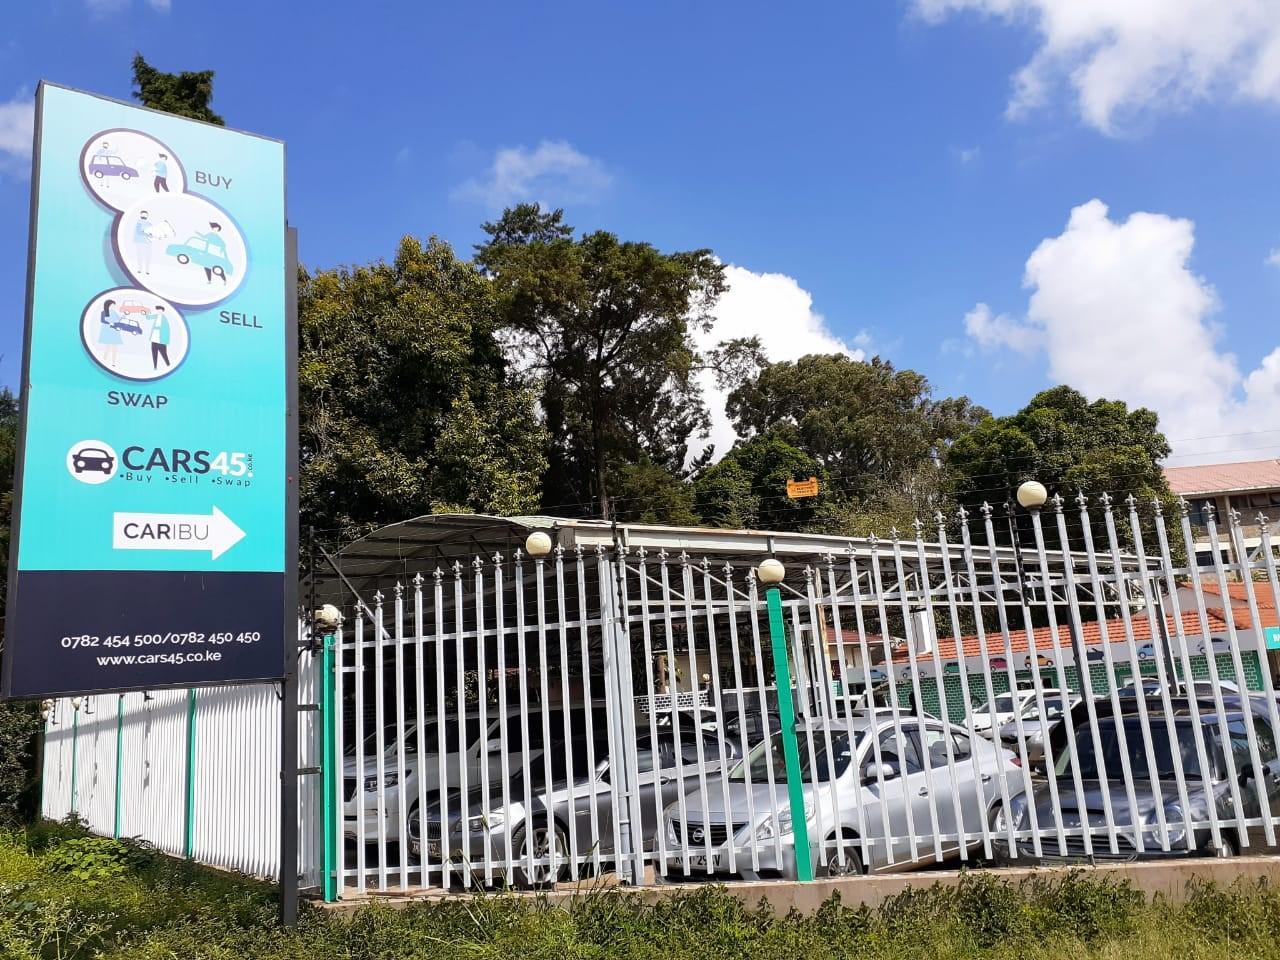 Cars45 plans to expand Kenyan market